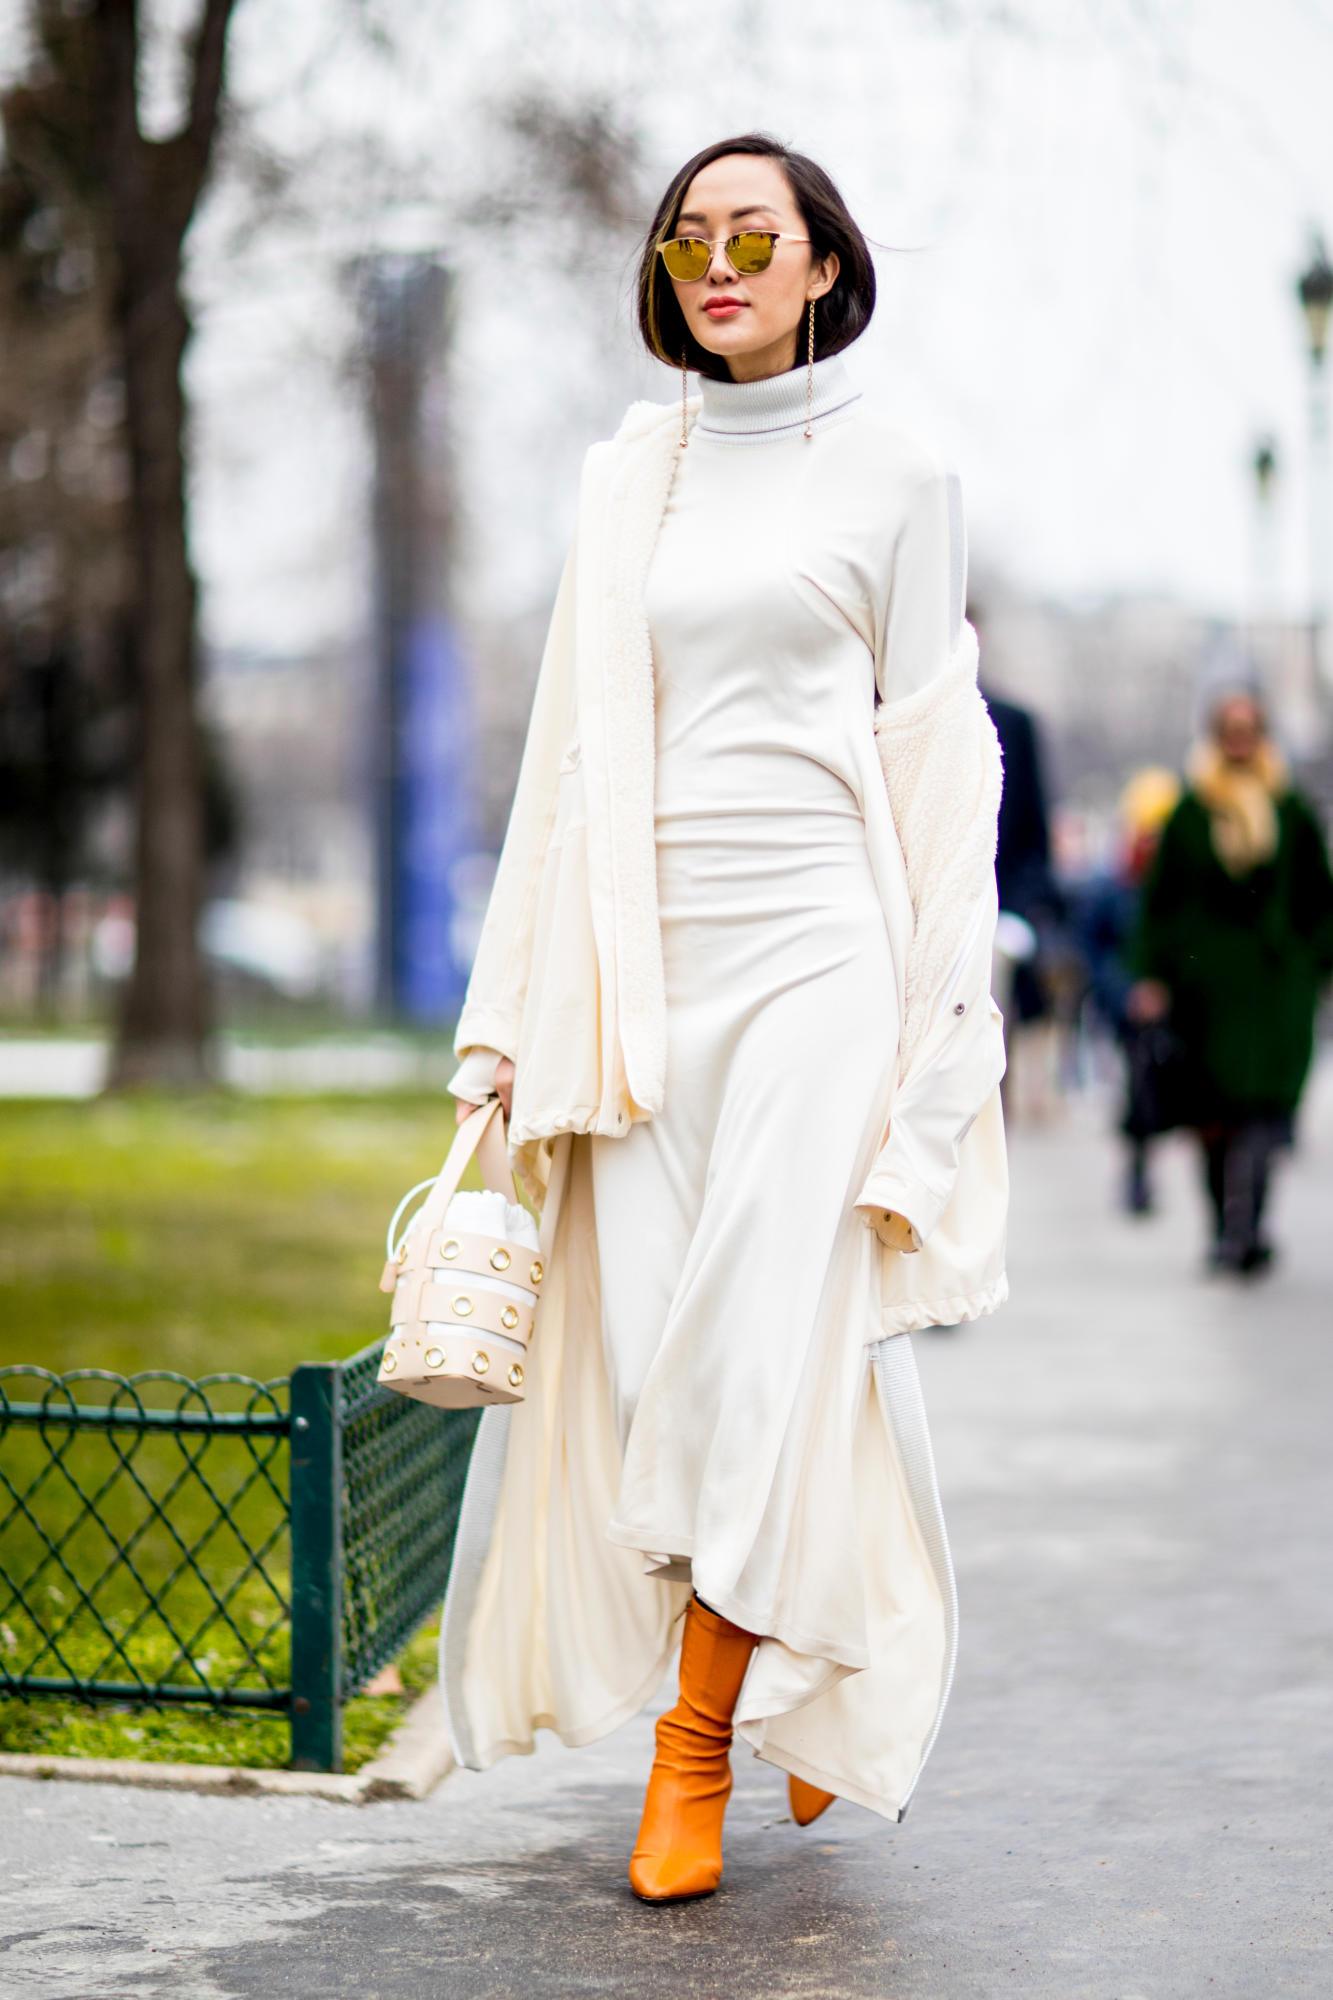 paris-fashion-week-street-style-fall-2018-day-3-41.jpg